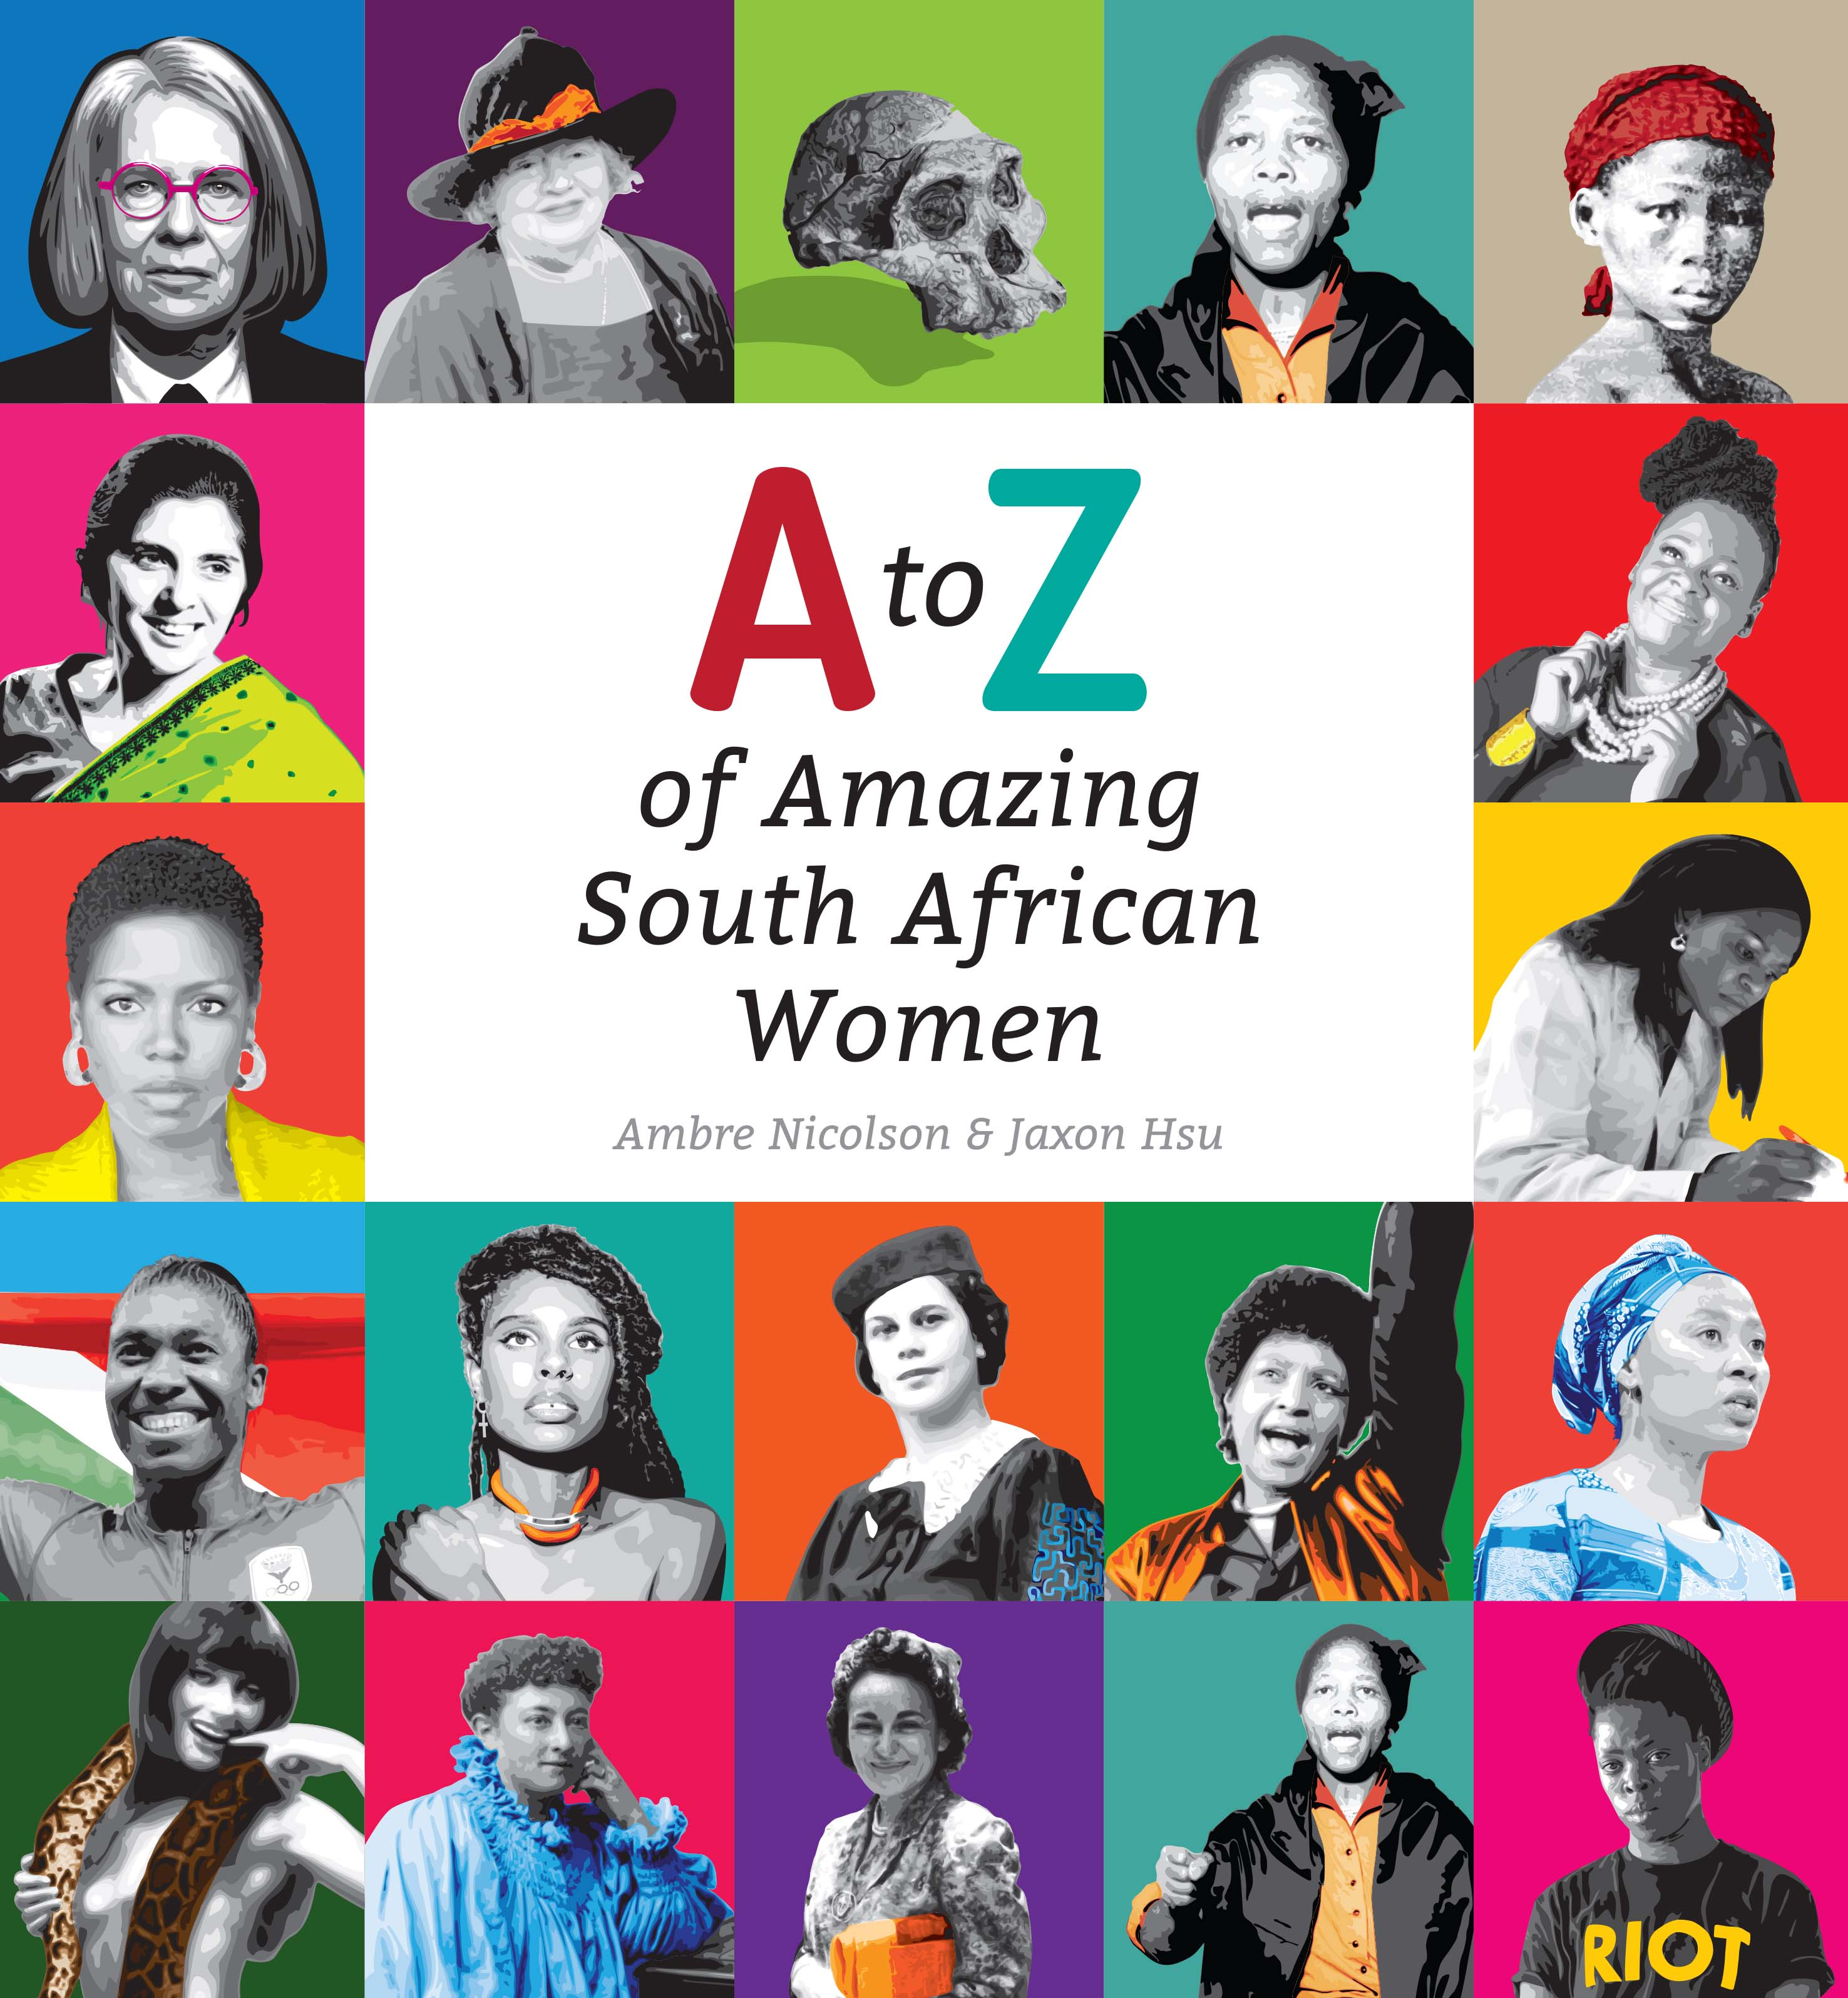 Book celebrating 26 trailblazing women